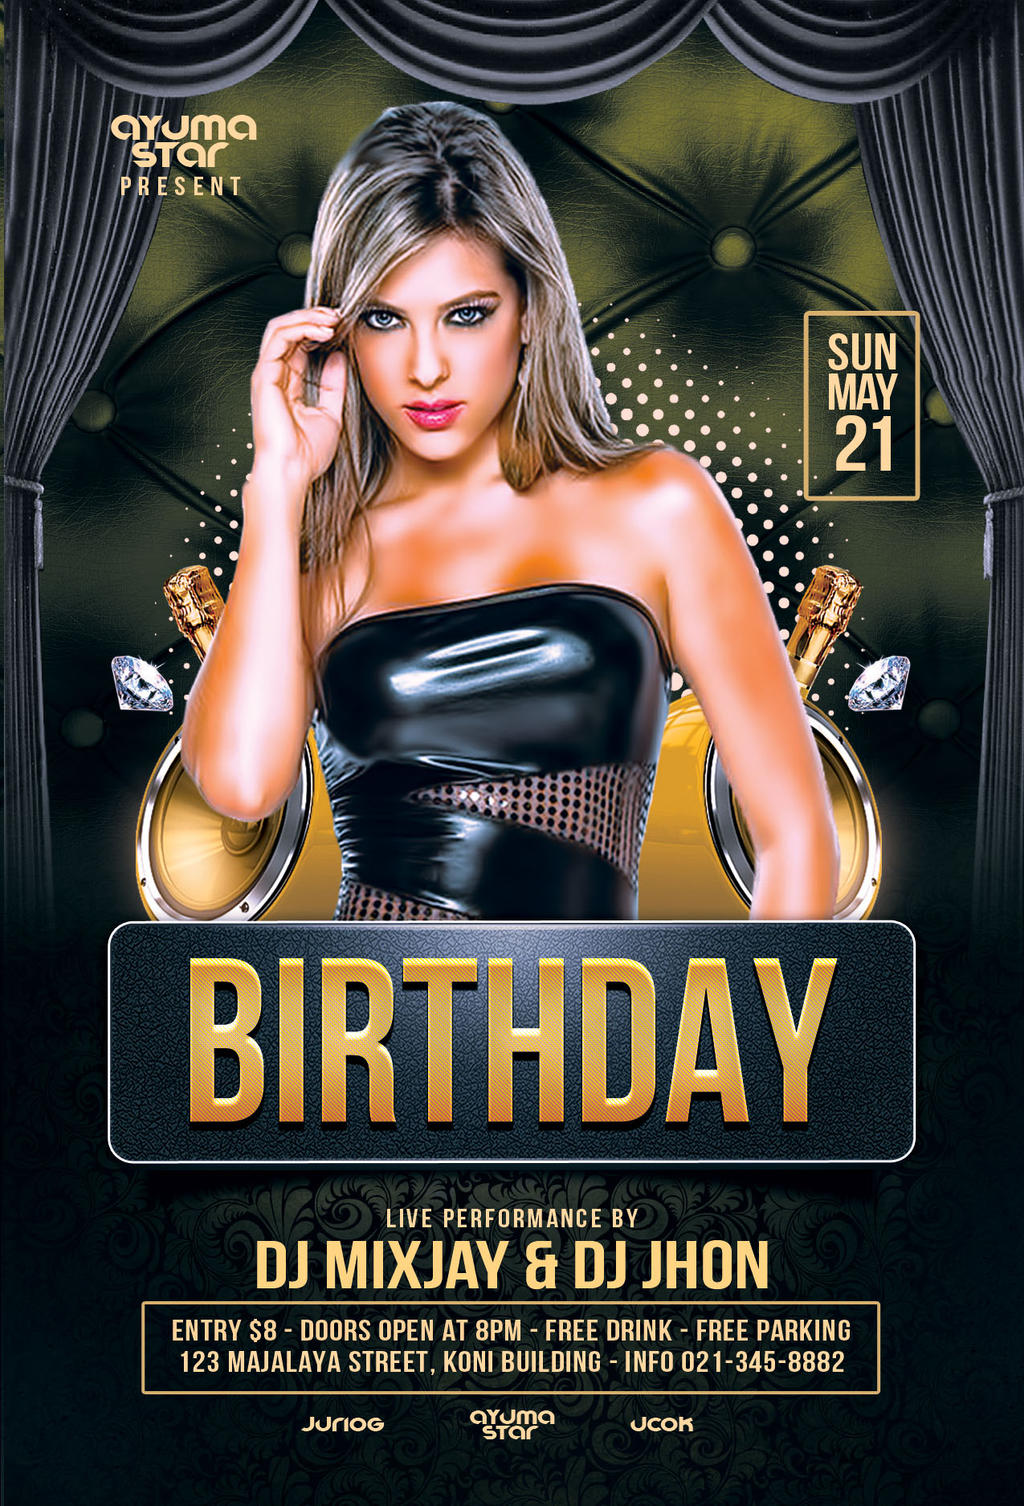 Birthday Flyer Template by ayumadesign on DeviantArt – Birthday Flyers Template